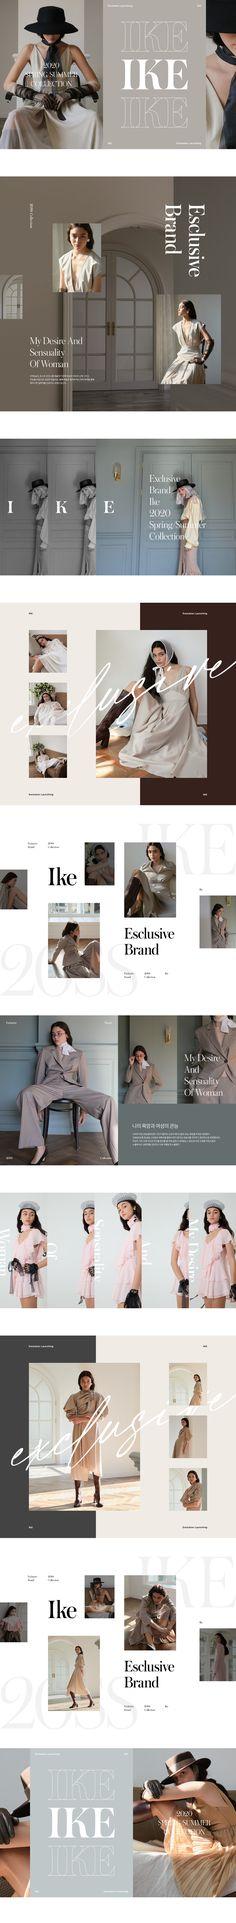 W concept – fashion editorial layout Design Poster, Book Design, Layout Design, Design Design, Stand Design, Fashion Web Design, Best Banner Design, Fashion Banner, Newspaper Design